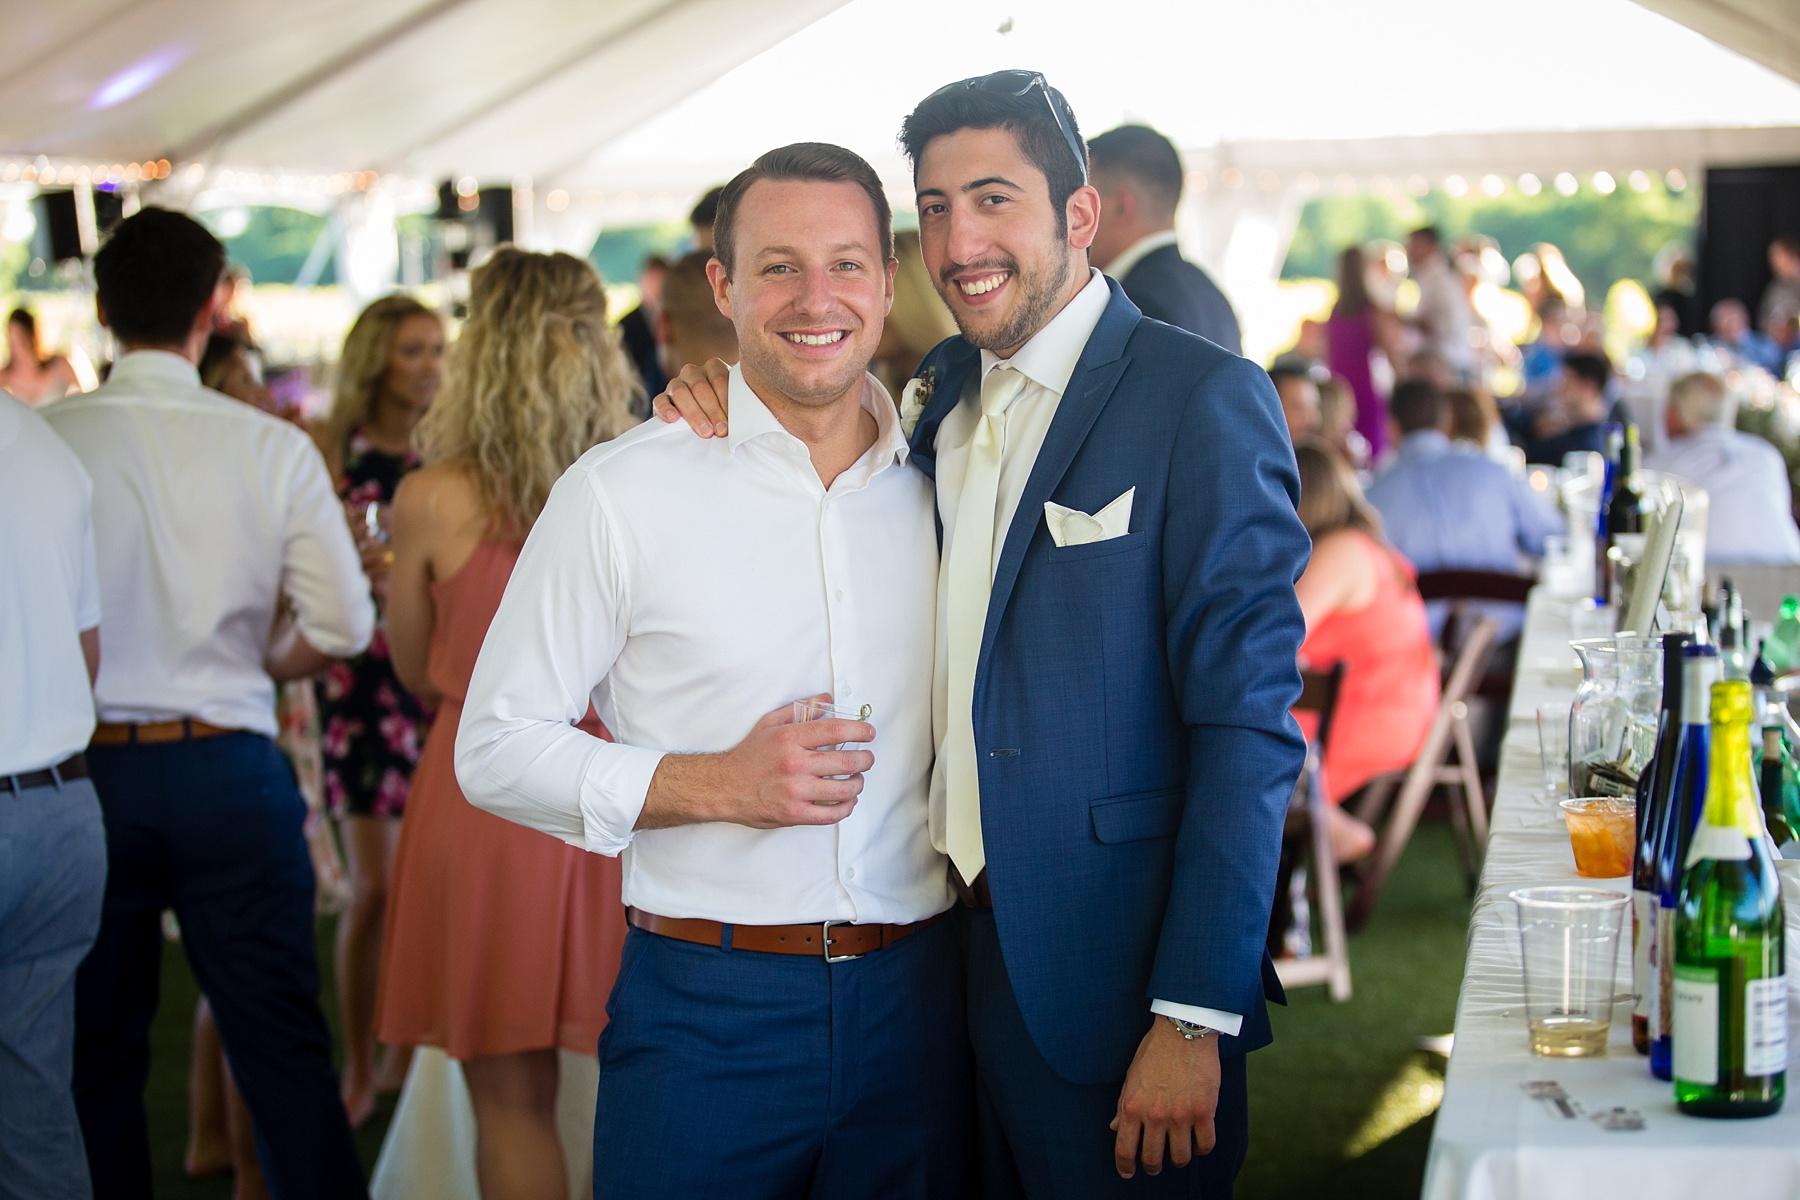 Brandon_Shafer_Photography_Kara_Doug_12_corners_Wedding_Benton_Harbor_0072.jpg